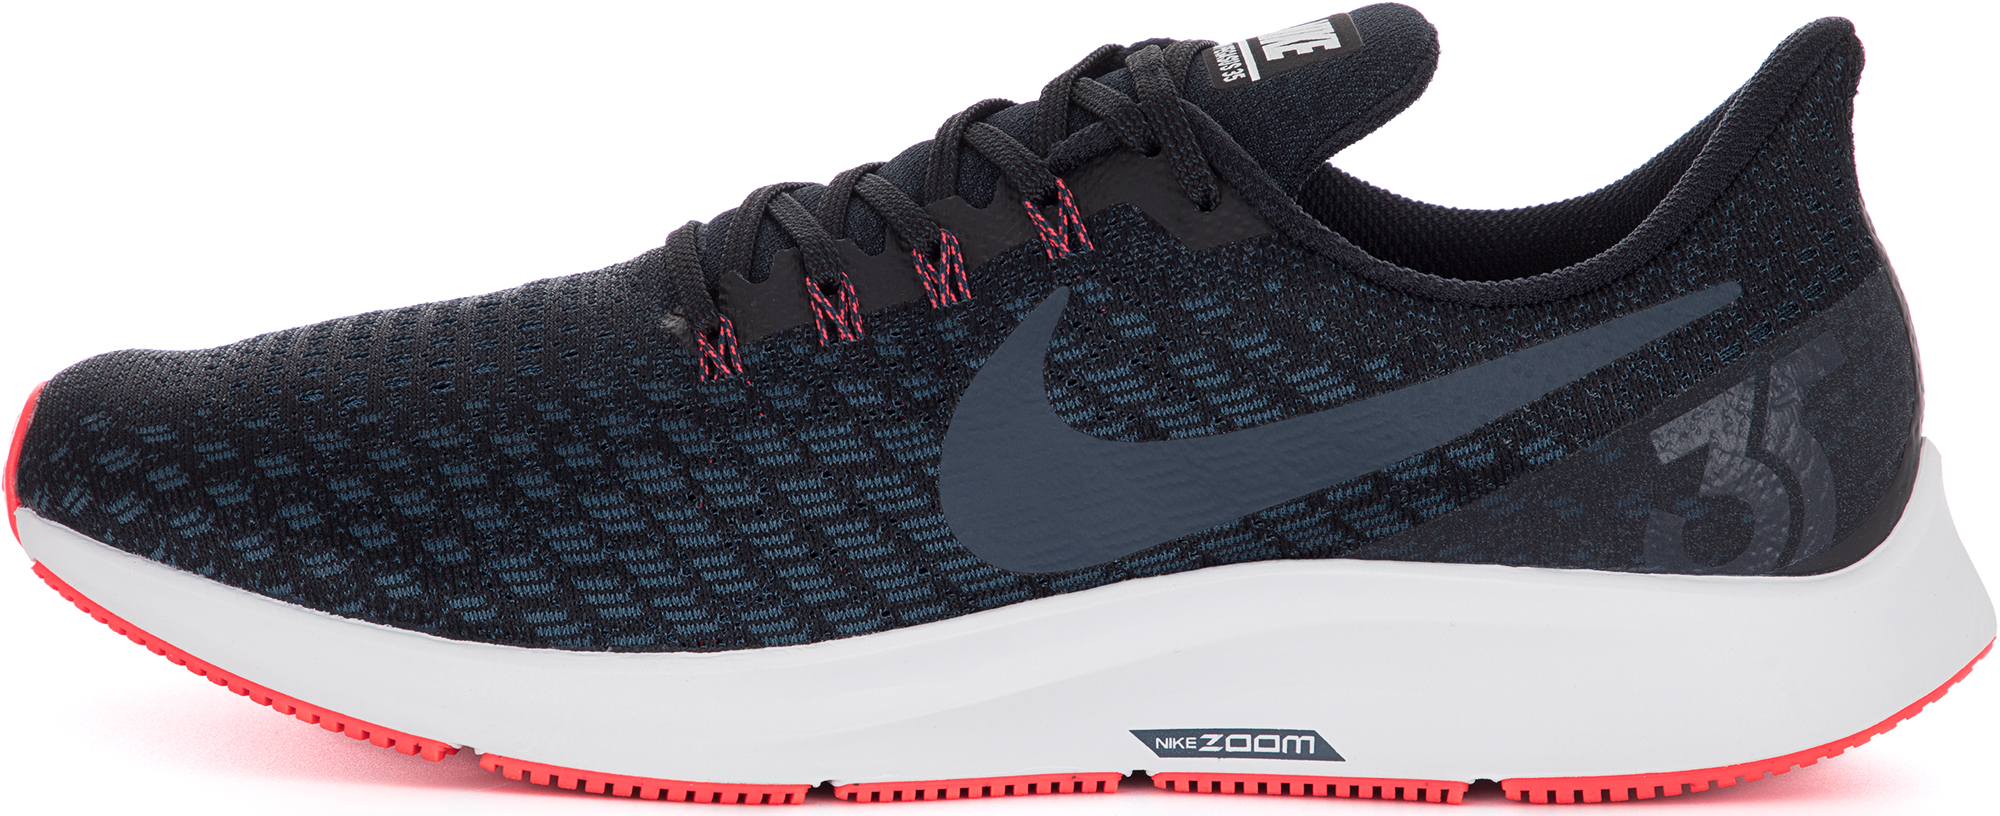 Nike Кроссовки мужские Nike Air Zoom Pegasus 35, размер 45